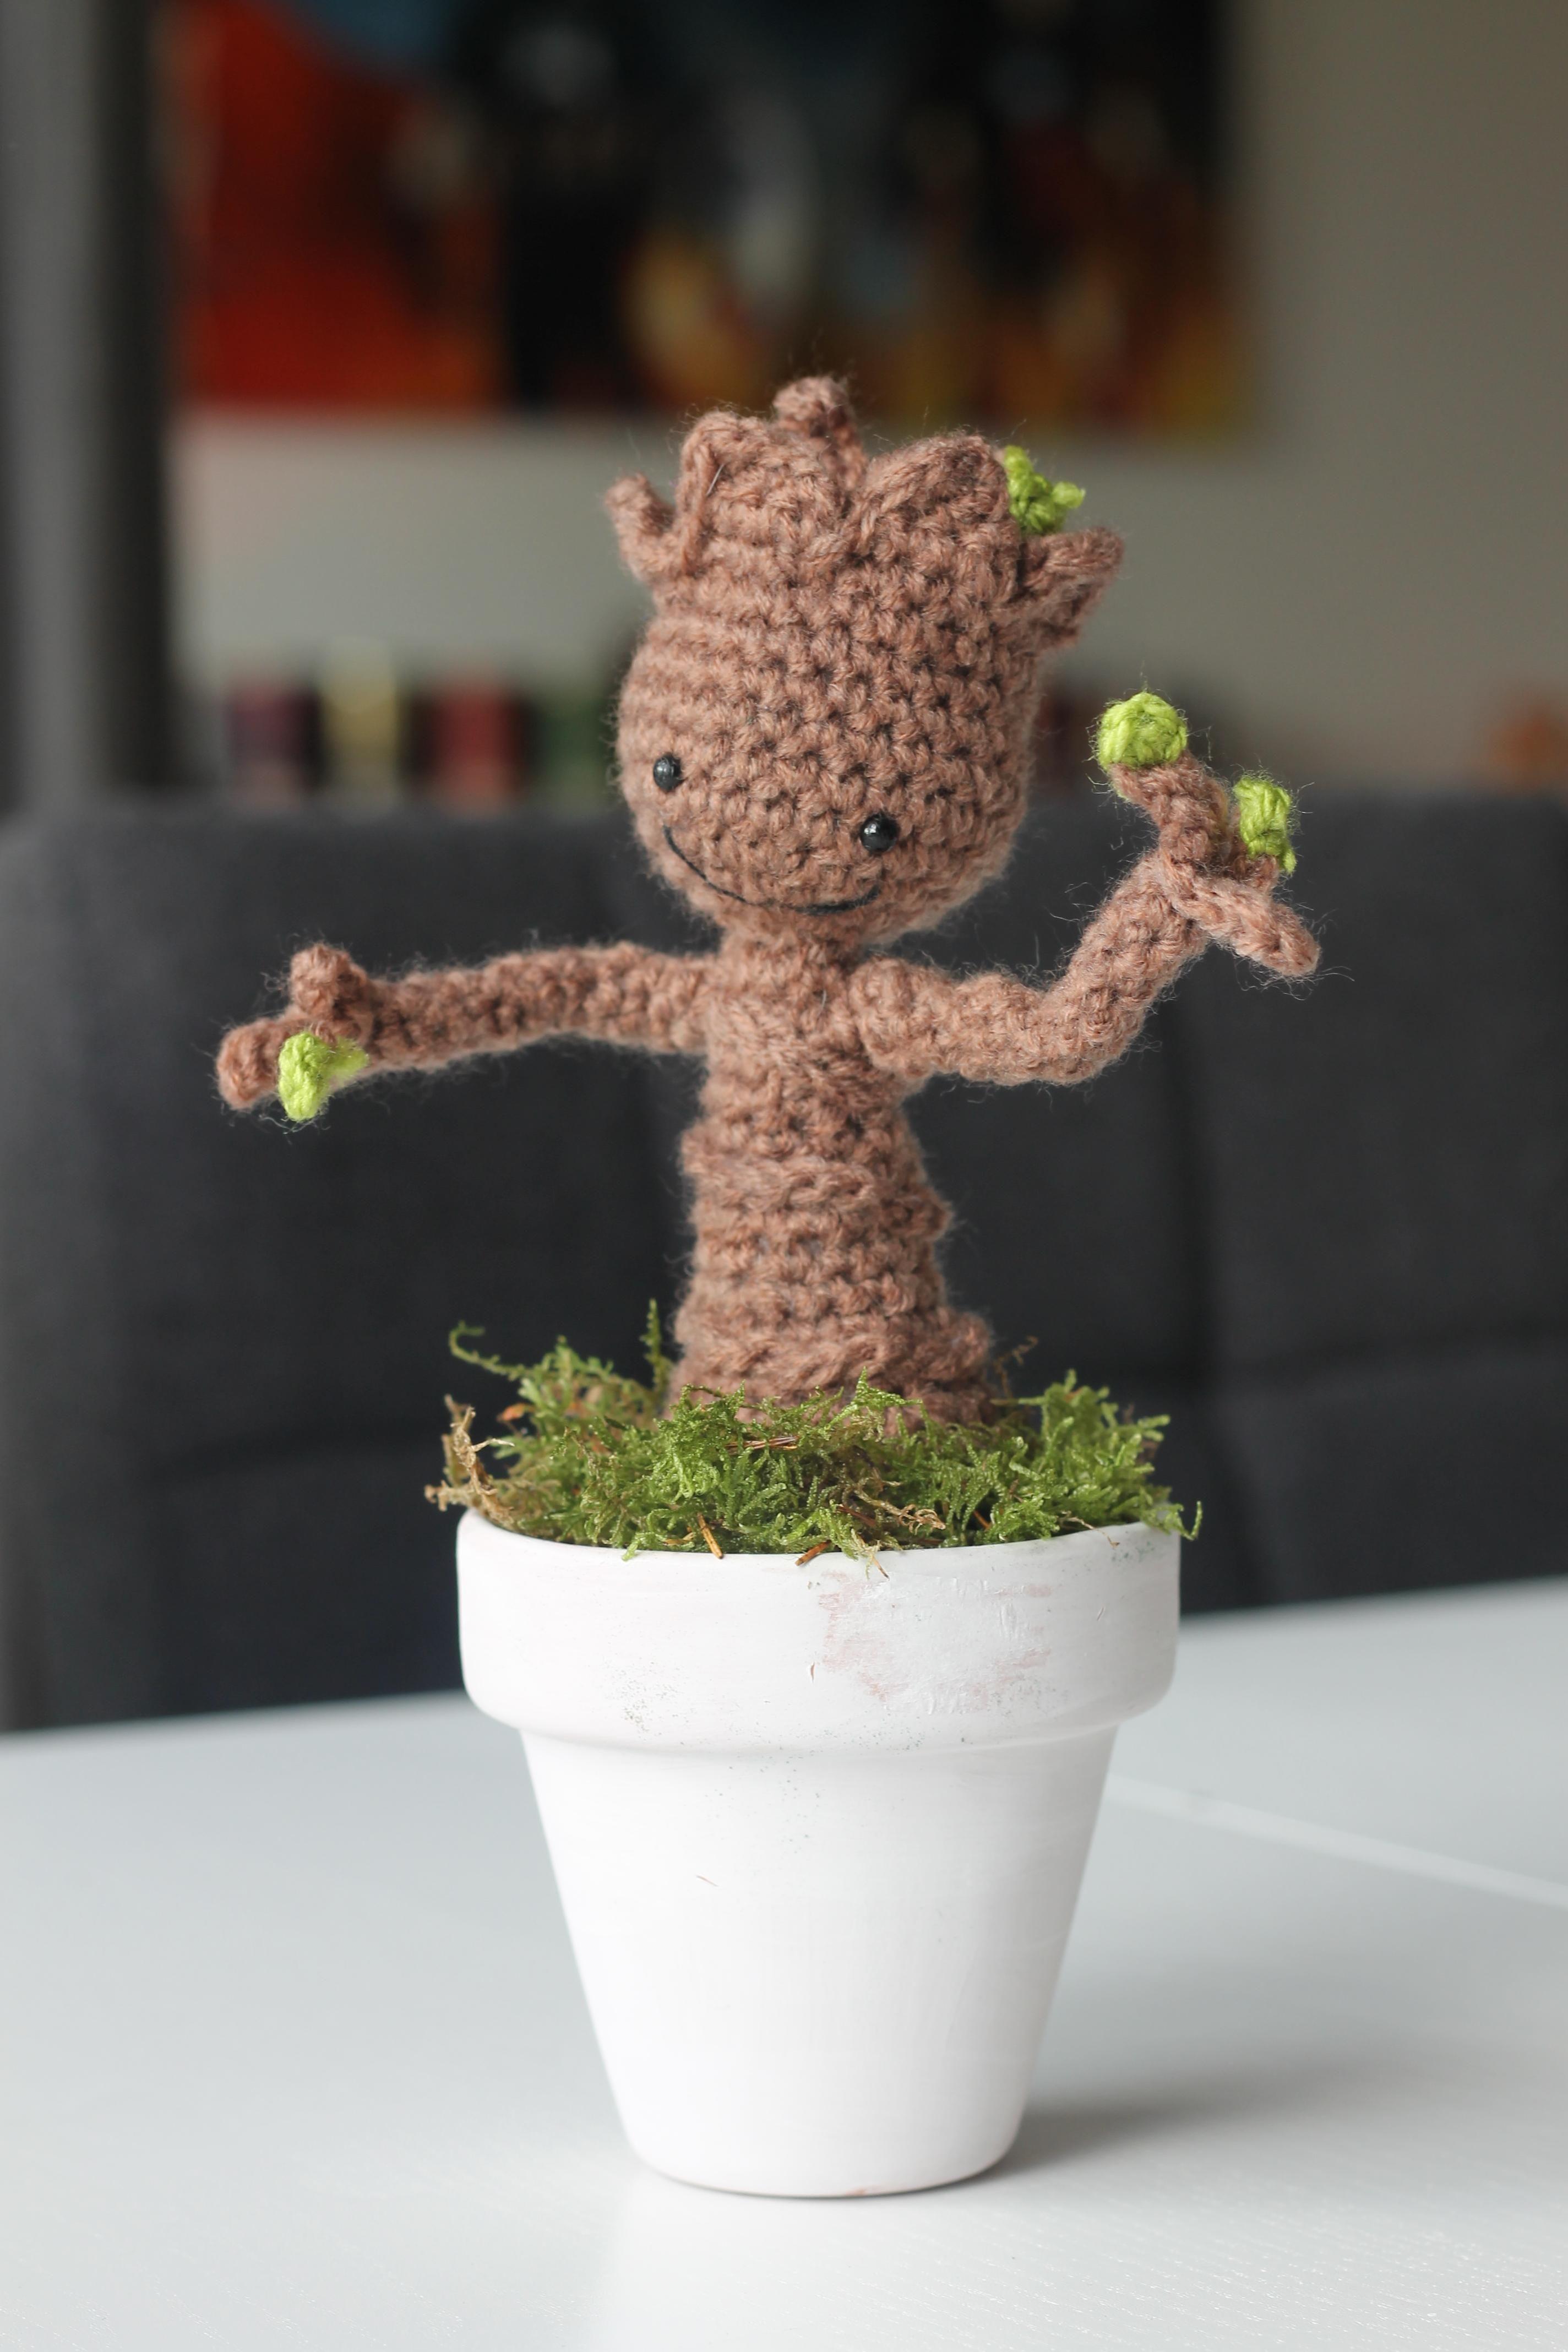 I crocheted my own baby Groot   Pinterest   Häkeln, Häkeltiere und ...